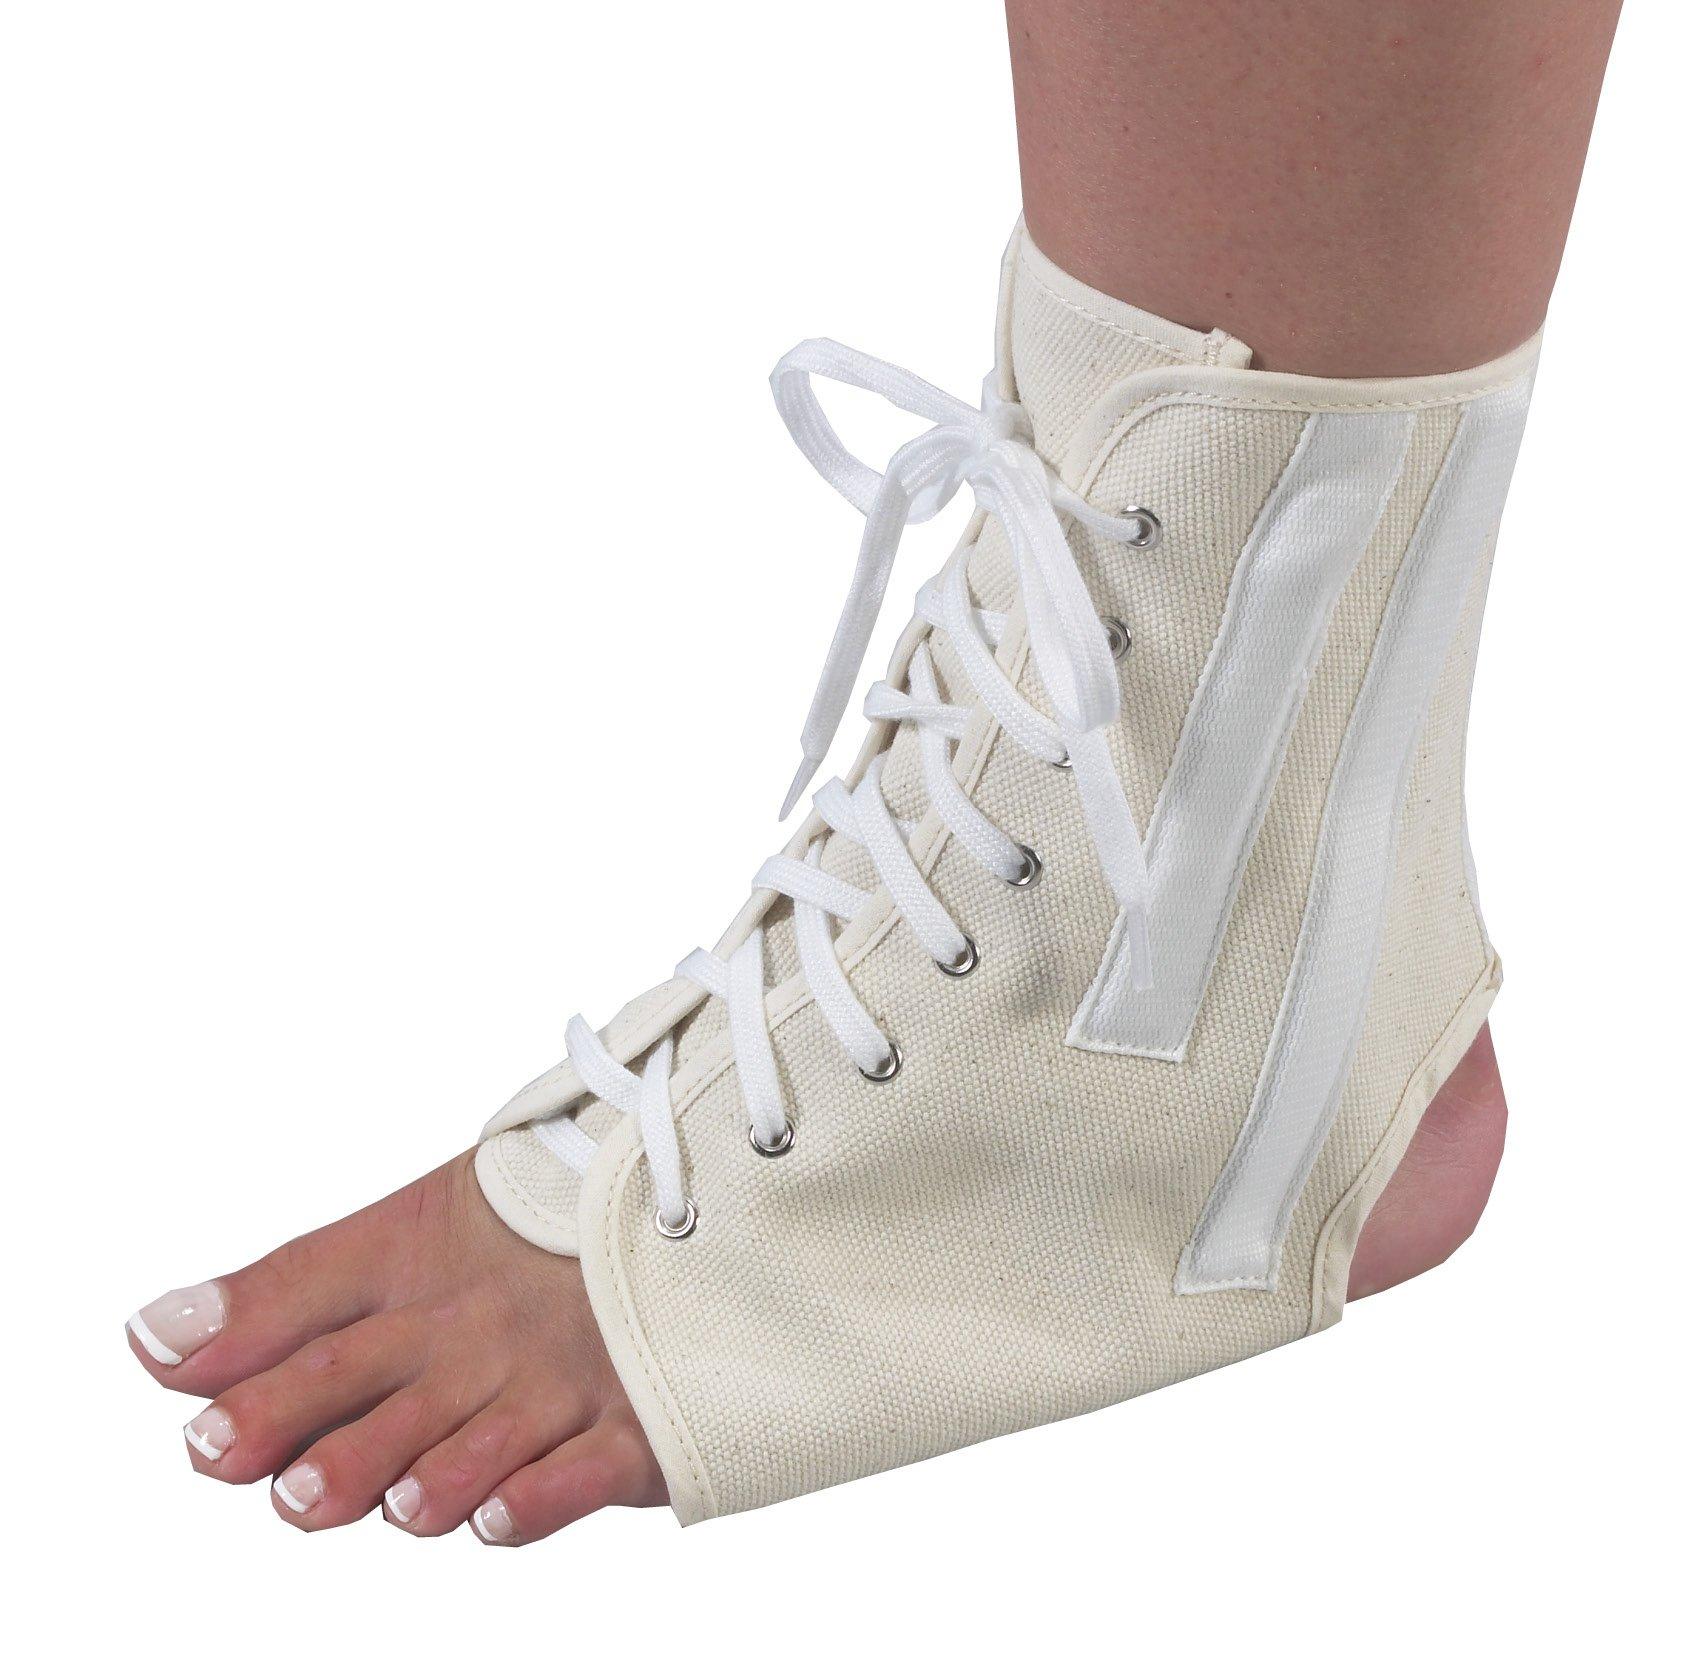 Bilt-Rite Mastex Health Canvas Ankle Brace with Laces, Beige, Medium